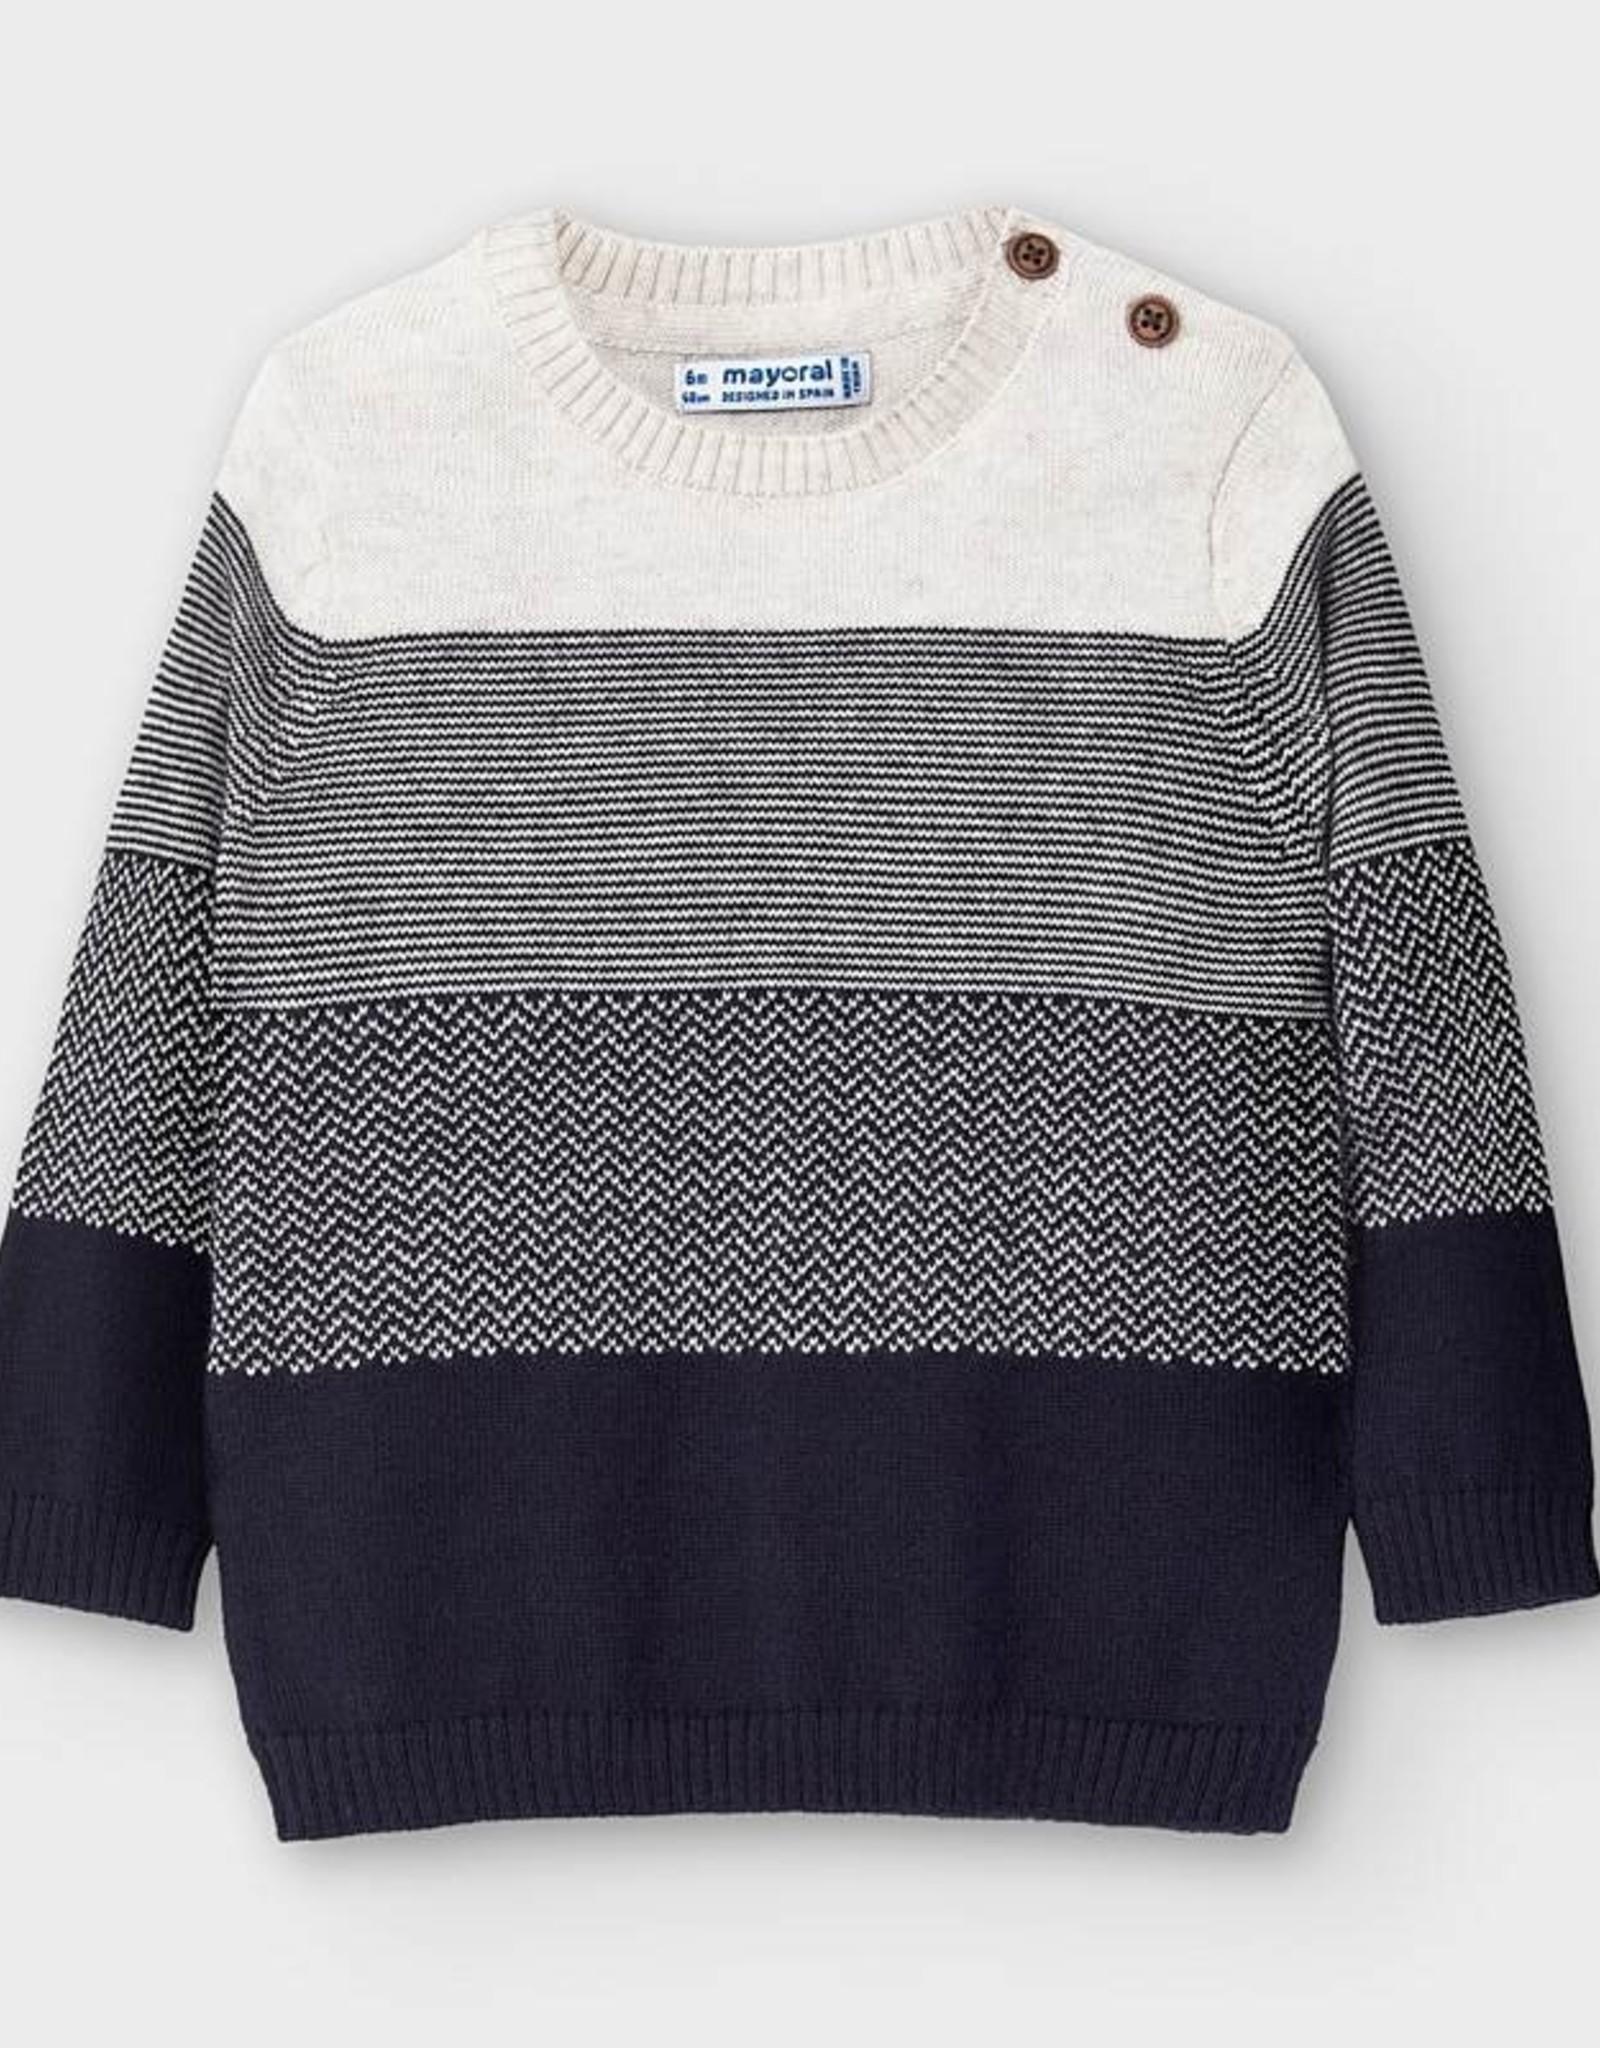 Mayoral FA20 Navy Stripe Sweater